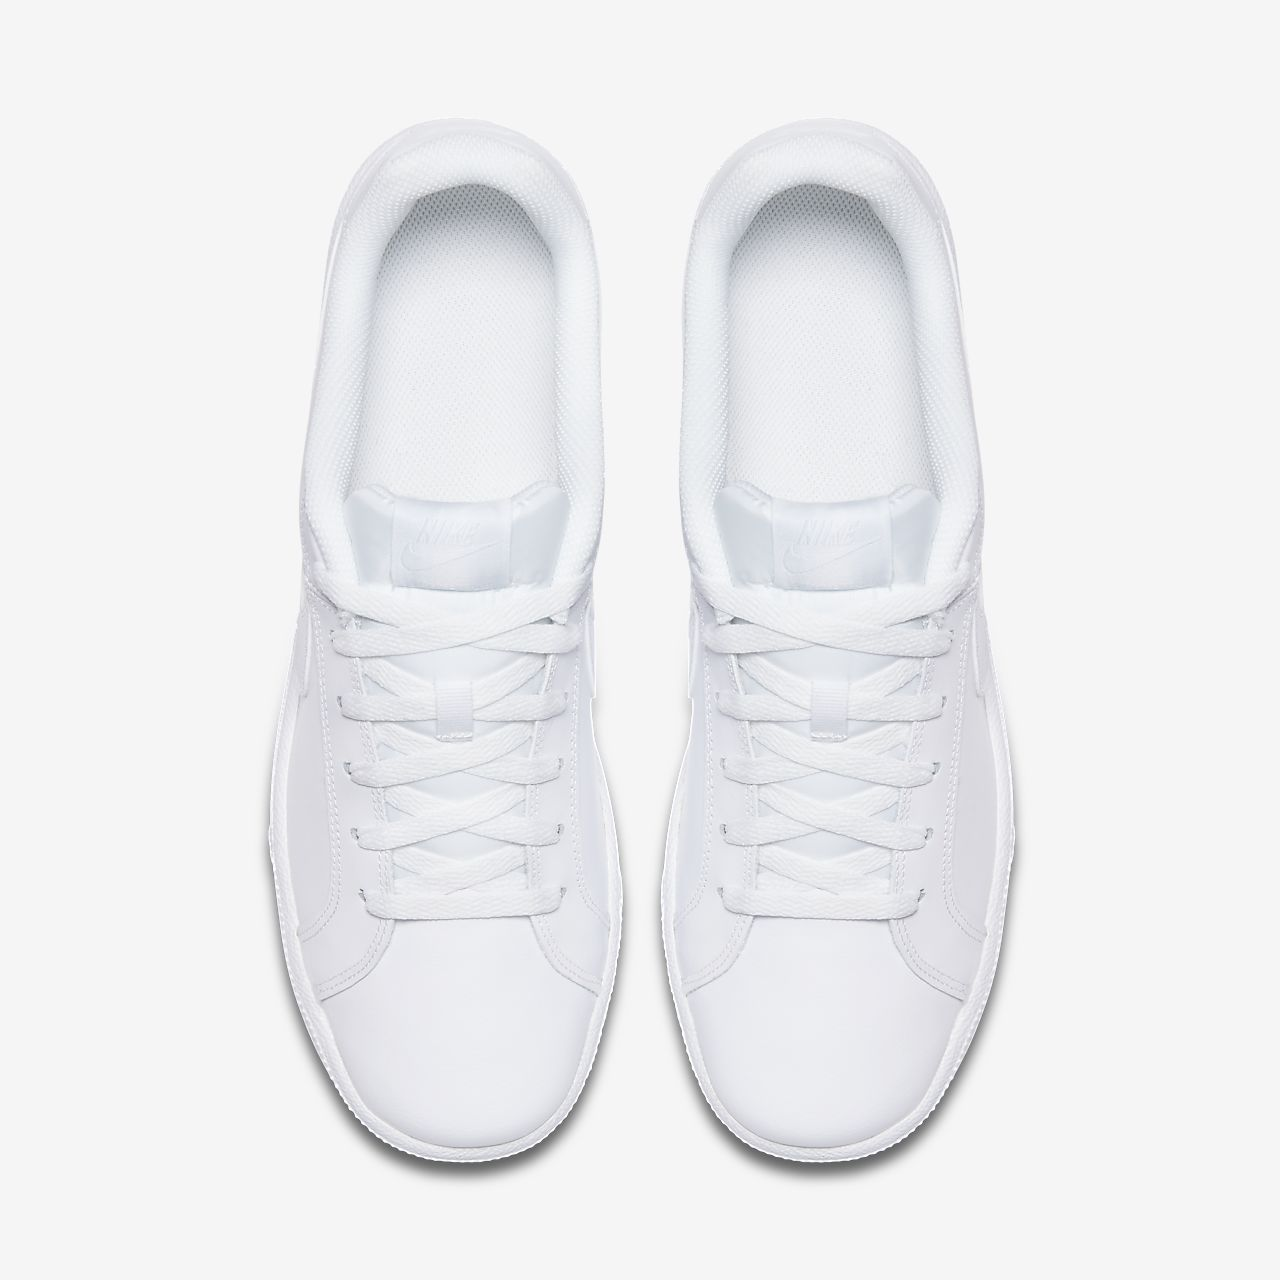 80b6be3534 Low Resolution NikeCourt Royale Men s Shoe NikeCourt Royale Men s Shoe